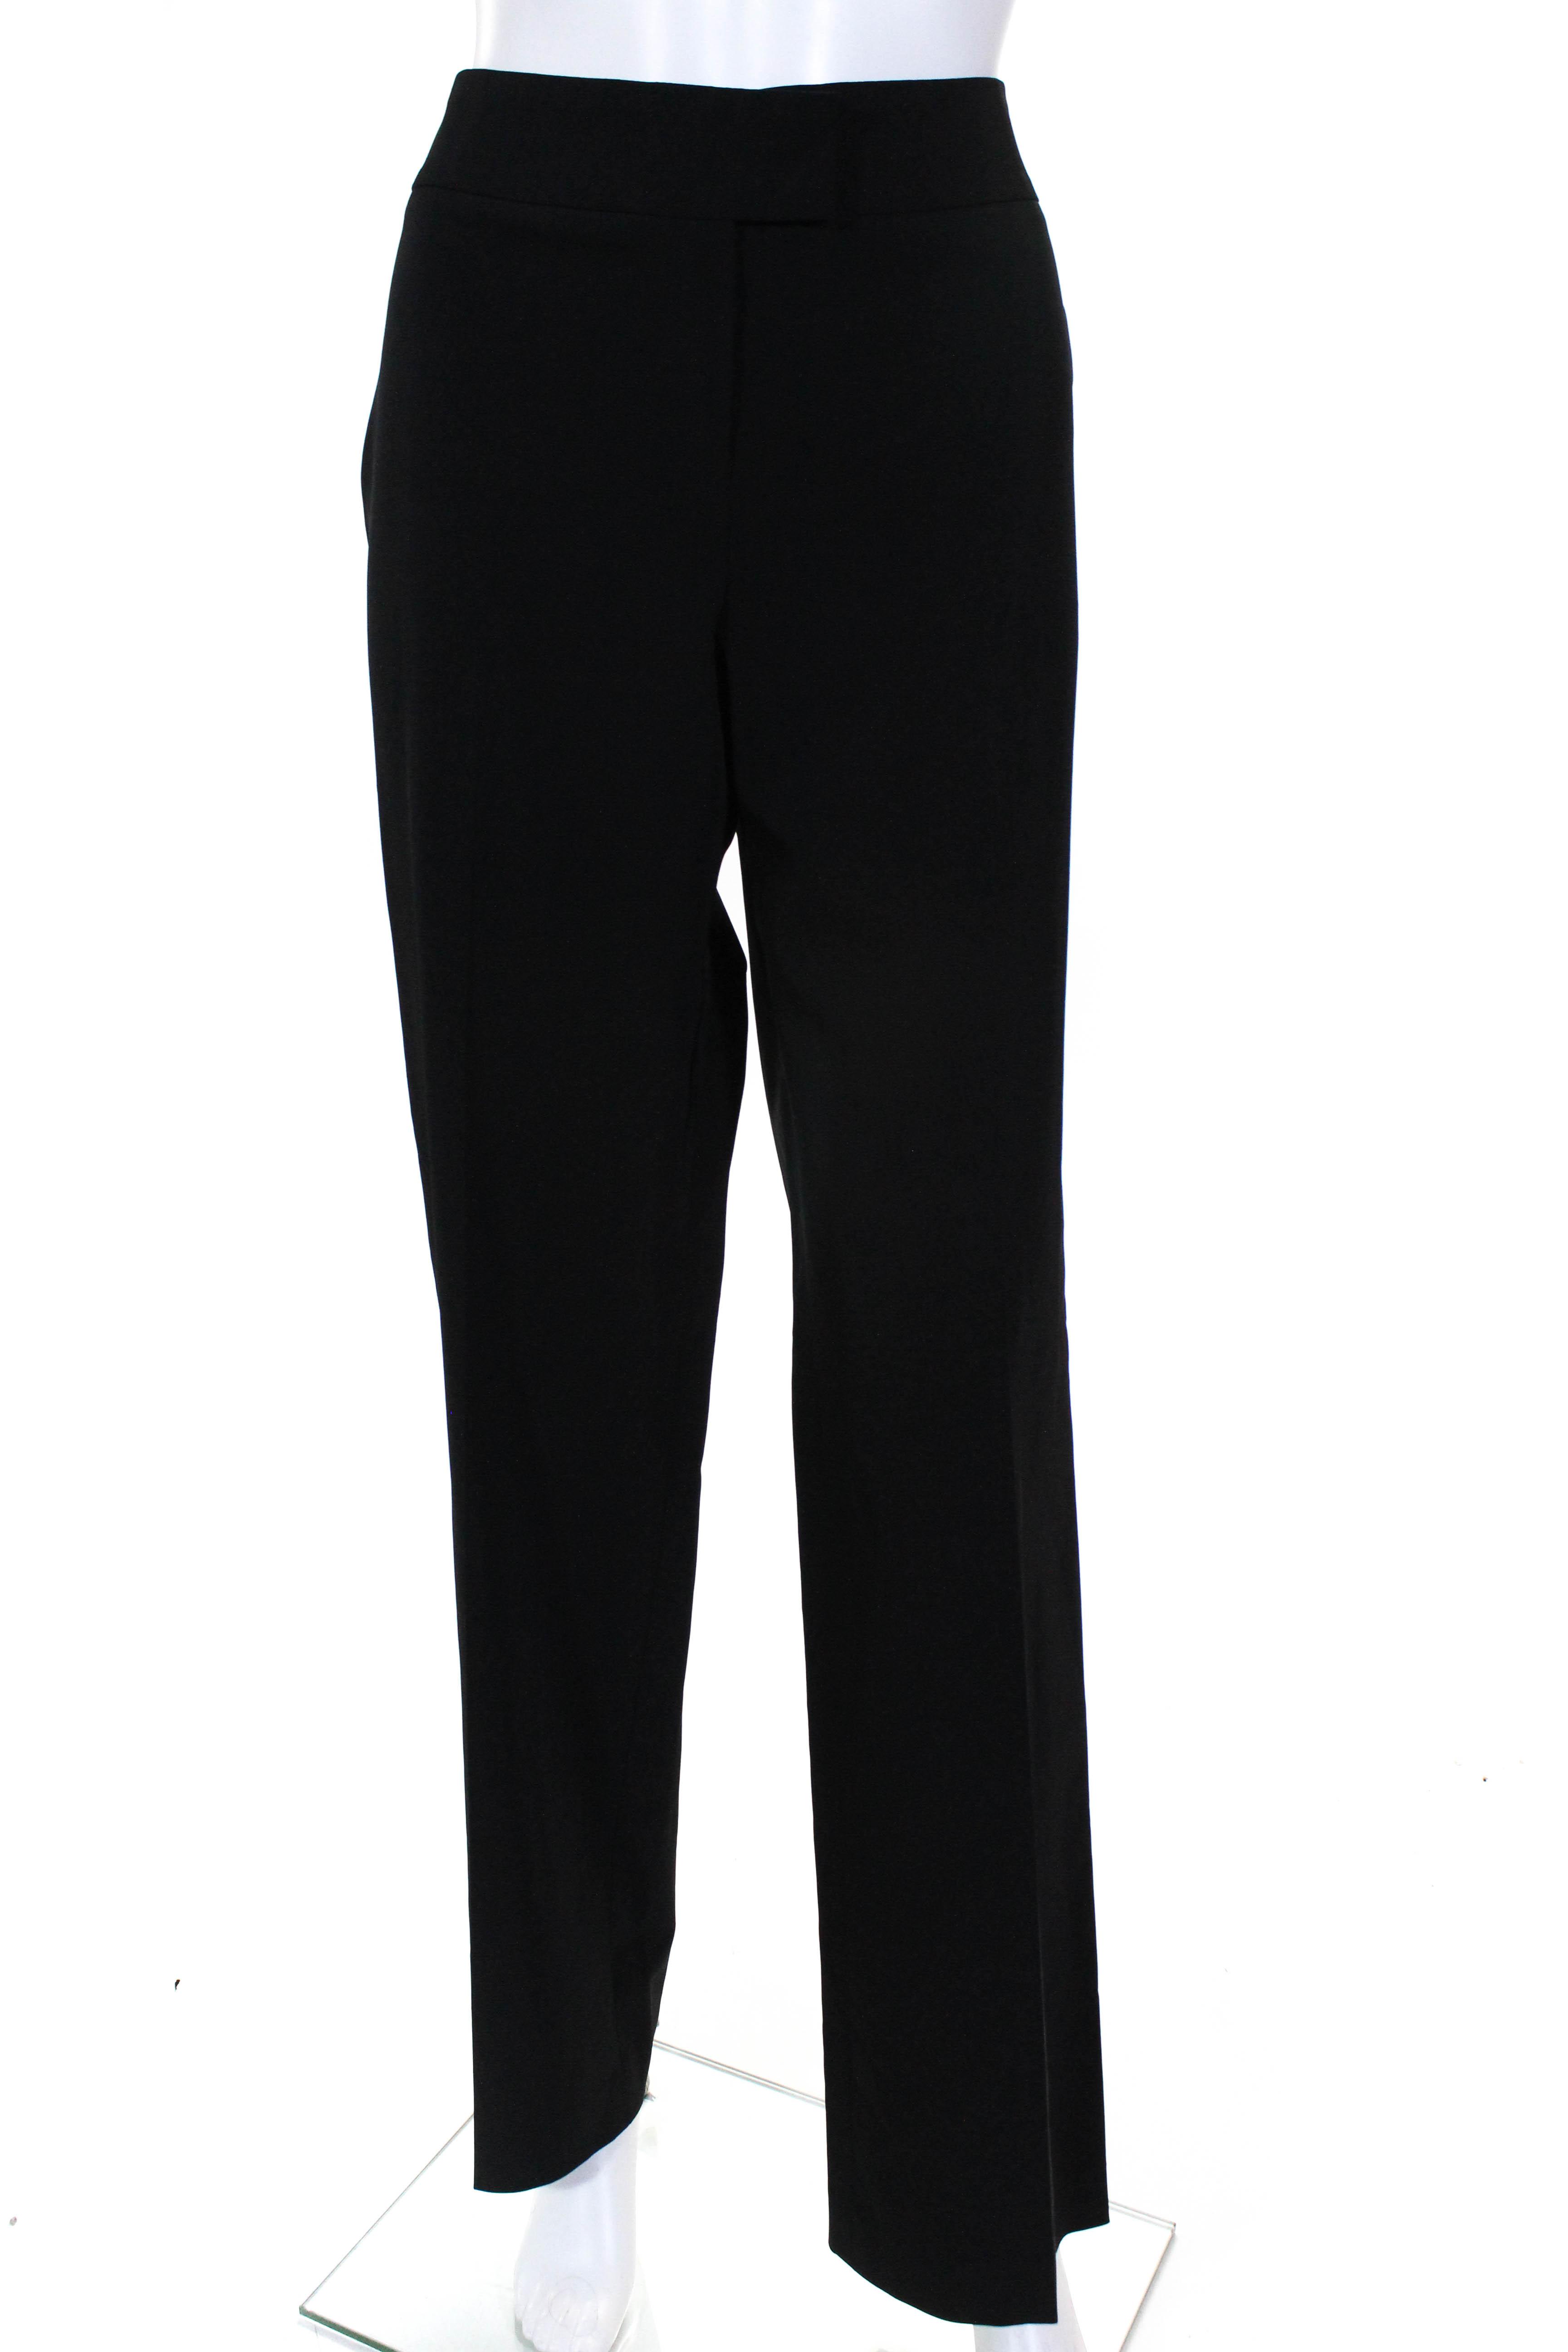 66b0df7396d6 Escada Womens Wide Leg Mid Rise Dress Pant Trousers Black Size 38 European